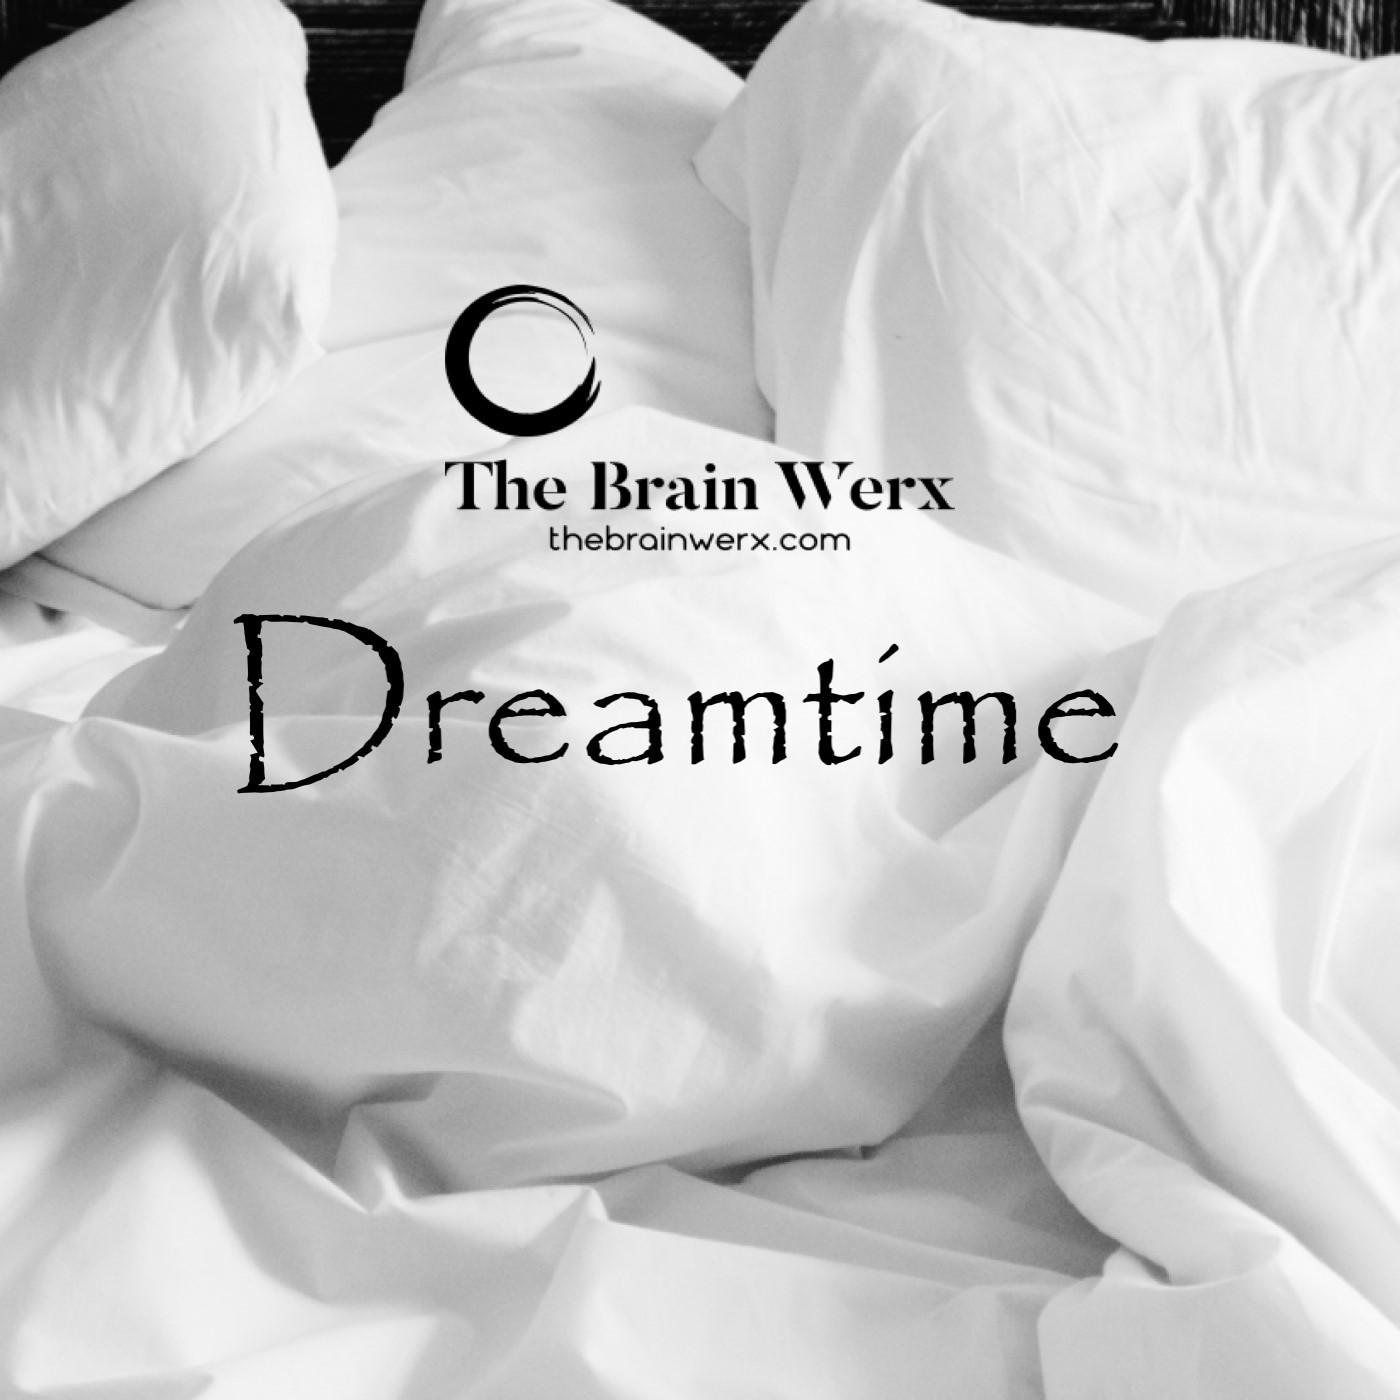 Dreamtime!